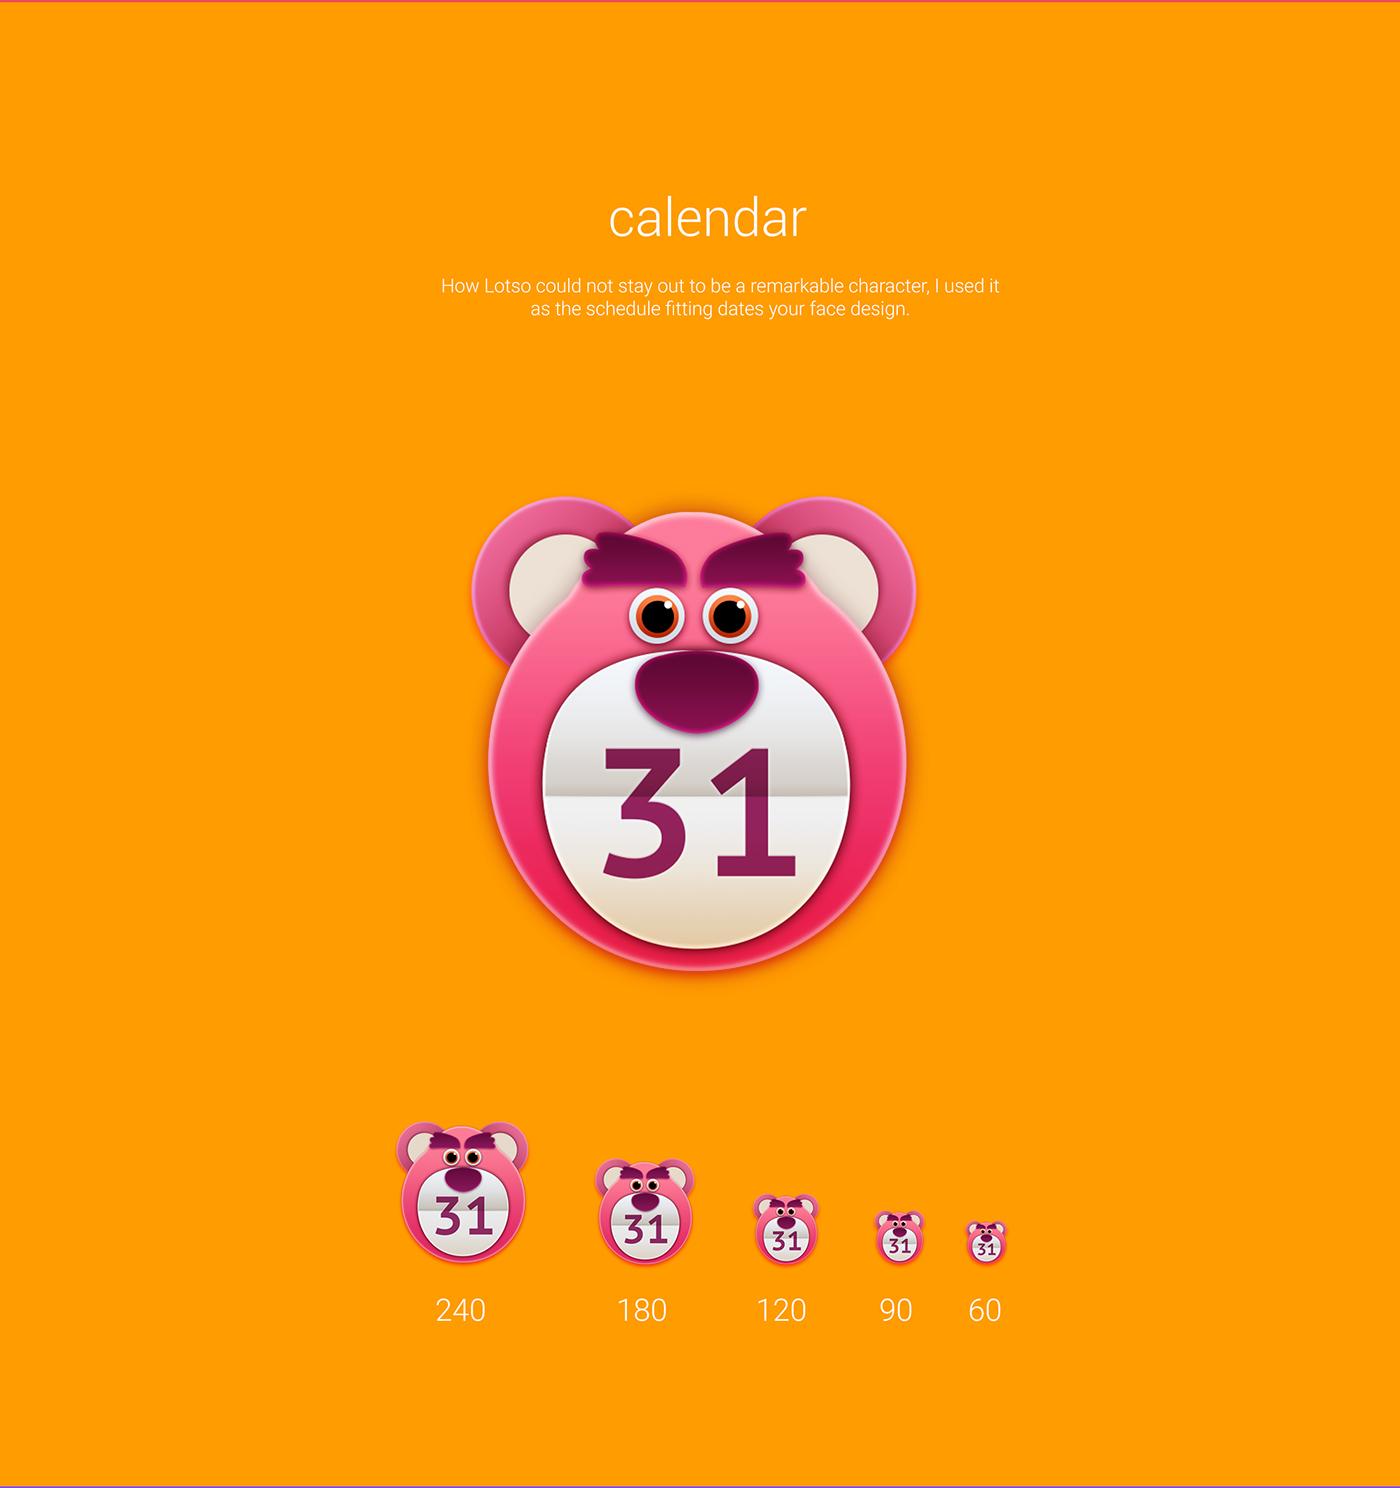 disney-pixar-toy-story-android-icons-leo-natsume-11